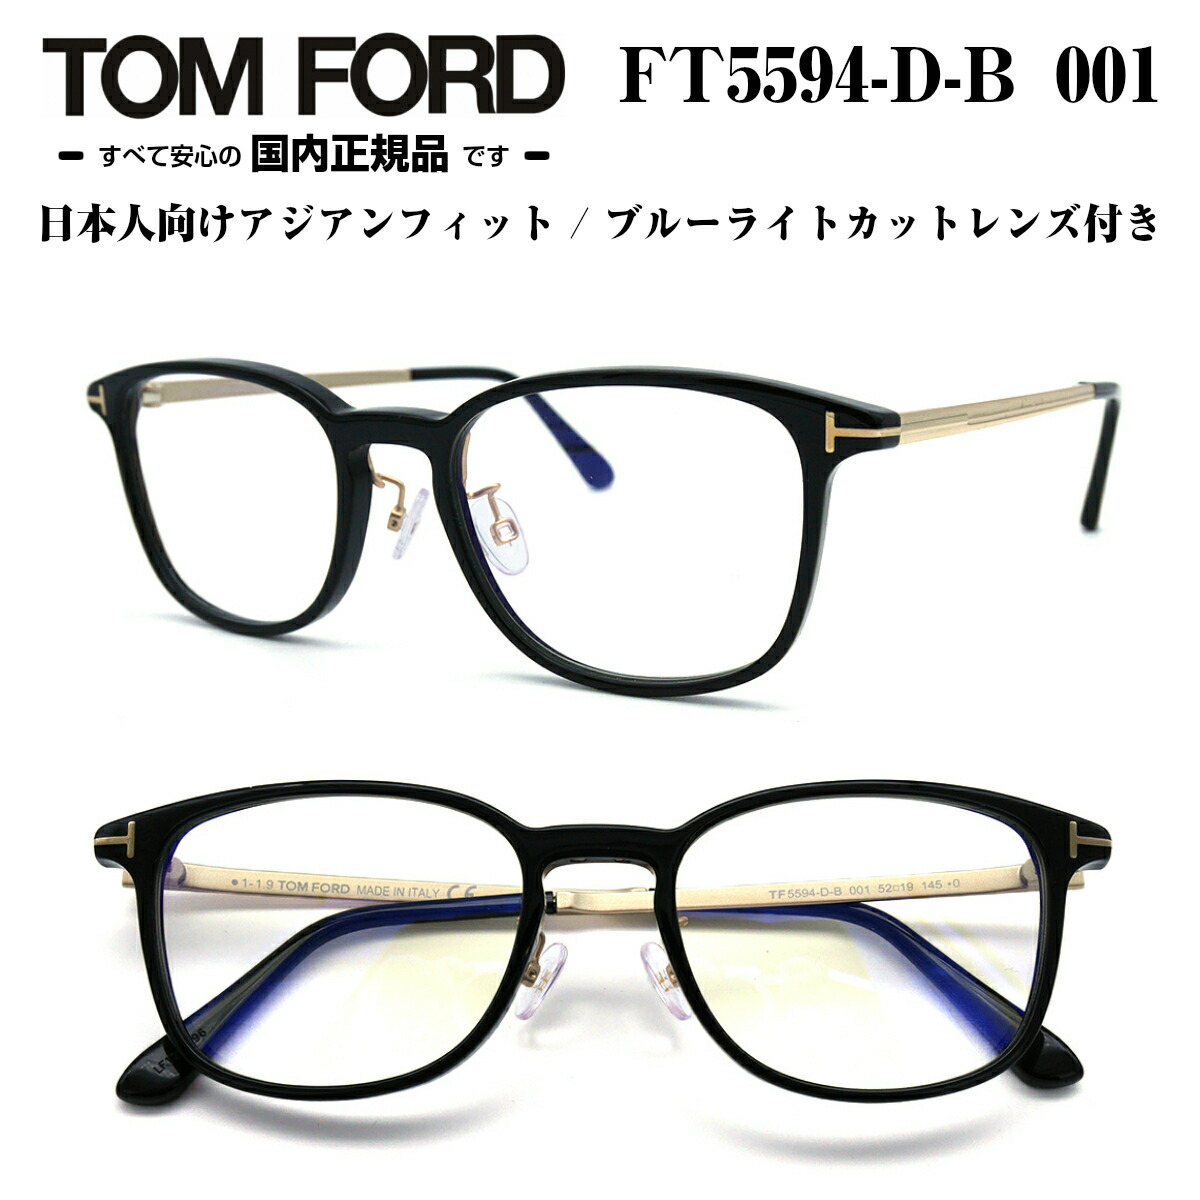 TOM FORD トムフォード FT5594DB-52001 (TF5594DB-52001) メガネ 眼鏡 めがね フレーム アジアフィット ブルーライトカットレンズ付き ダテメガネ 【正規品】 度付き対応 TOMFORD メンズ 男性 おしゃれ